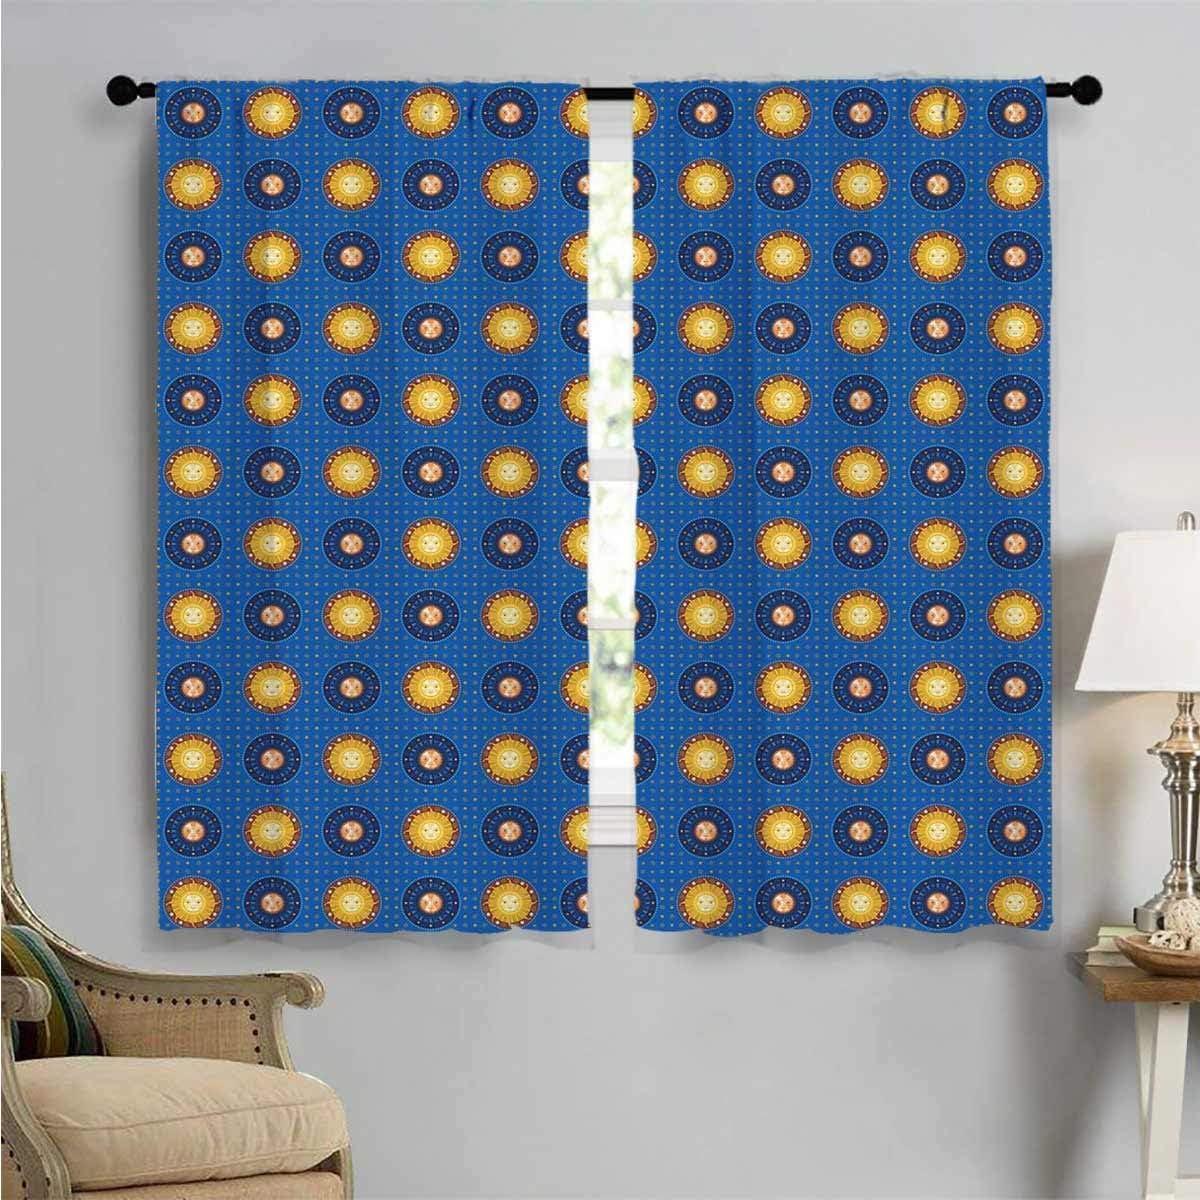 Window Max 89% OFF Curtain Drape Astronomic Price reduction Prints Ornaments Art Tr